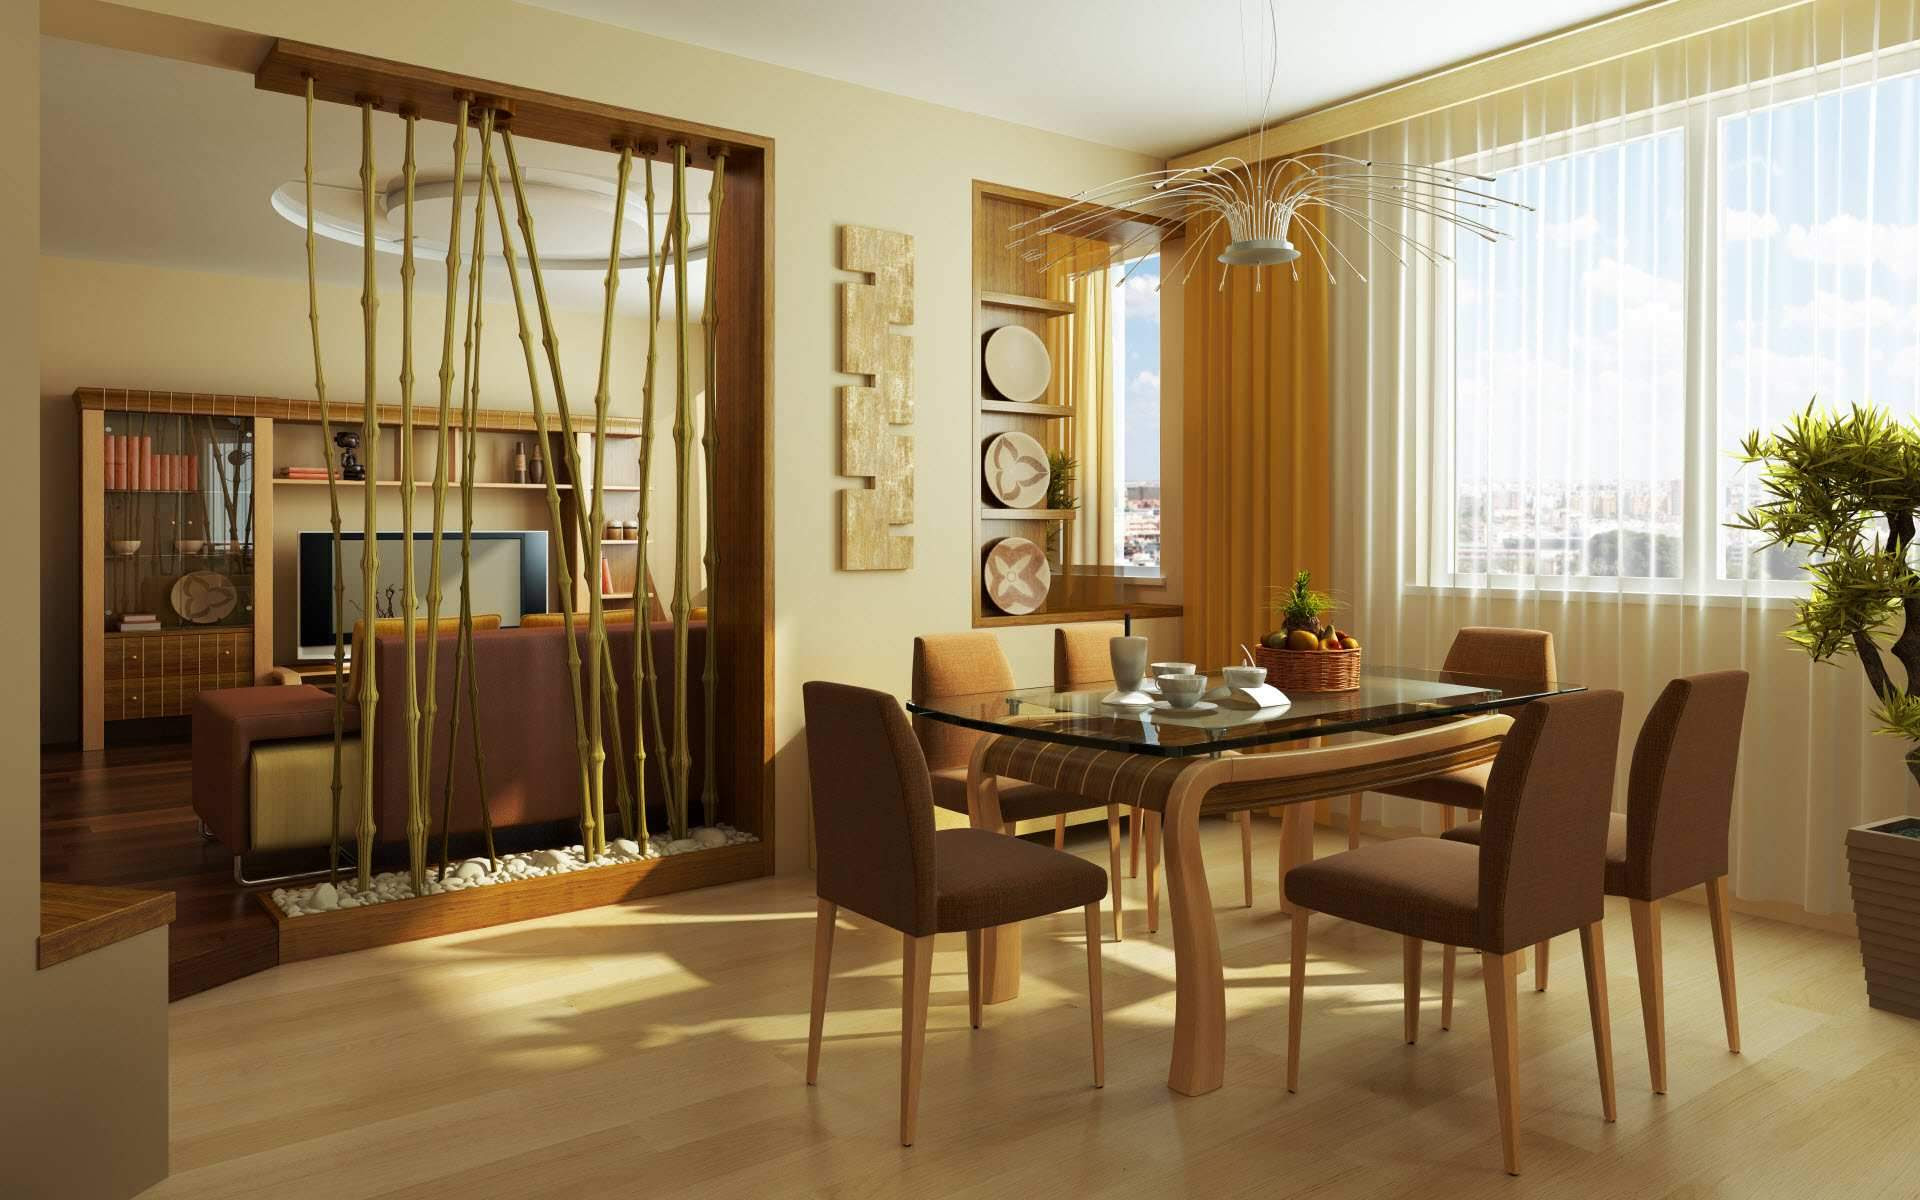 Inspiring Dining Room Interior Design Ideas You Must Try